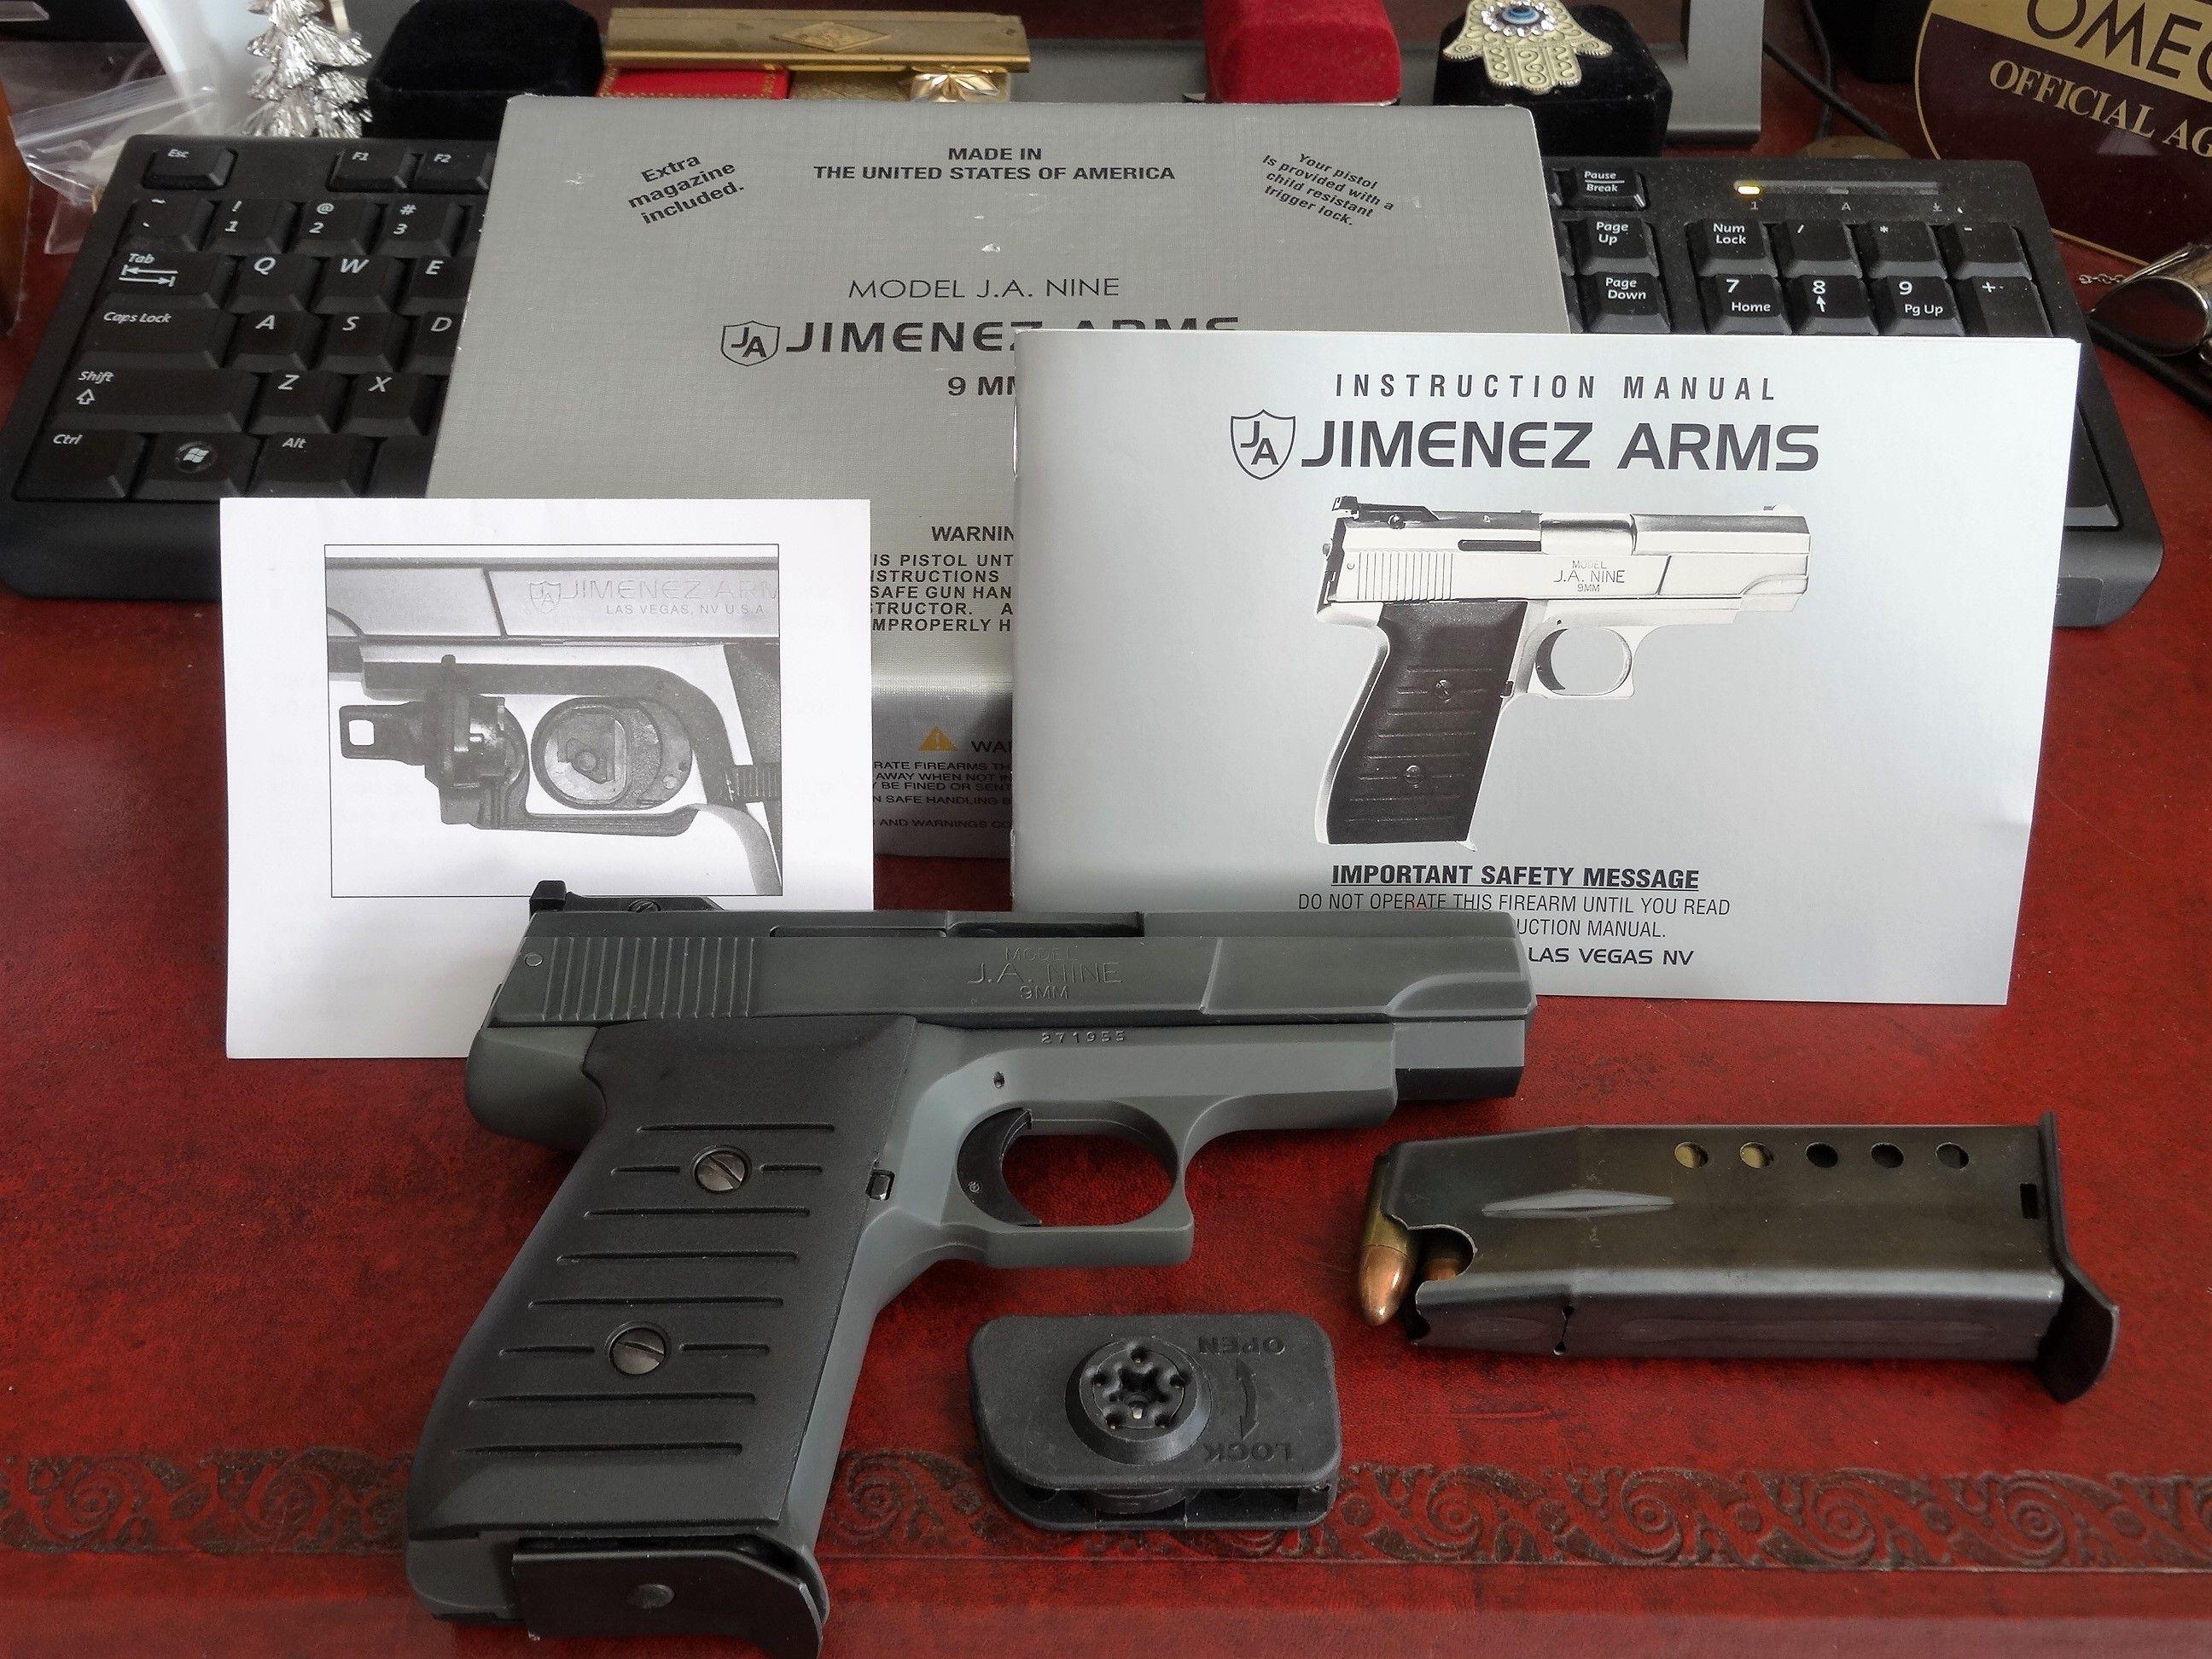 Jimenez Arms Model J A  Nine 9MM Pistol New in Box! New in